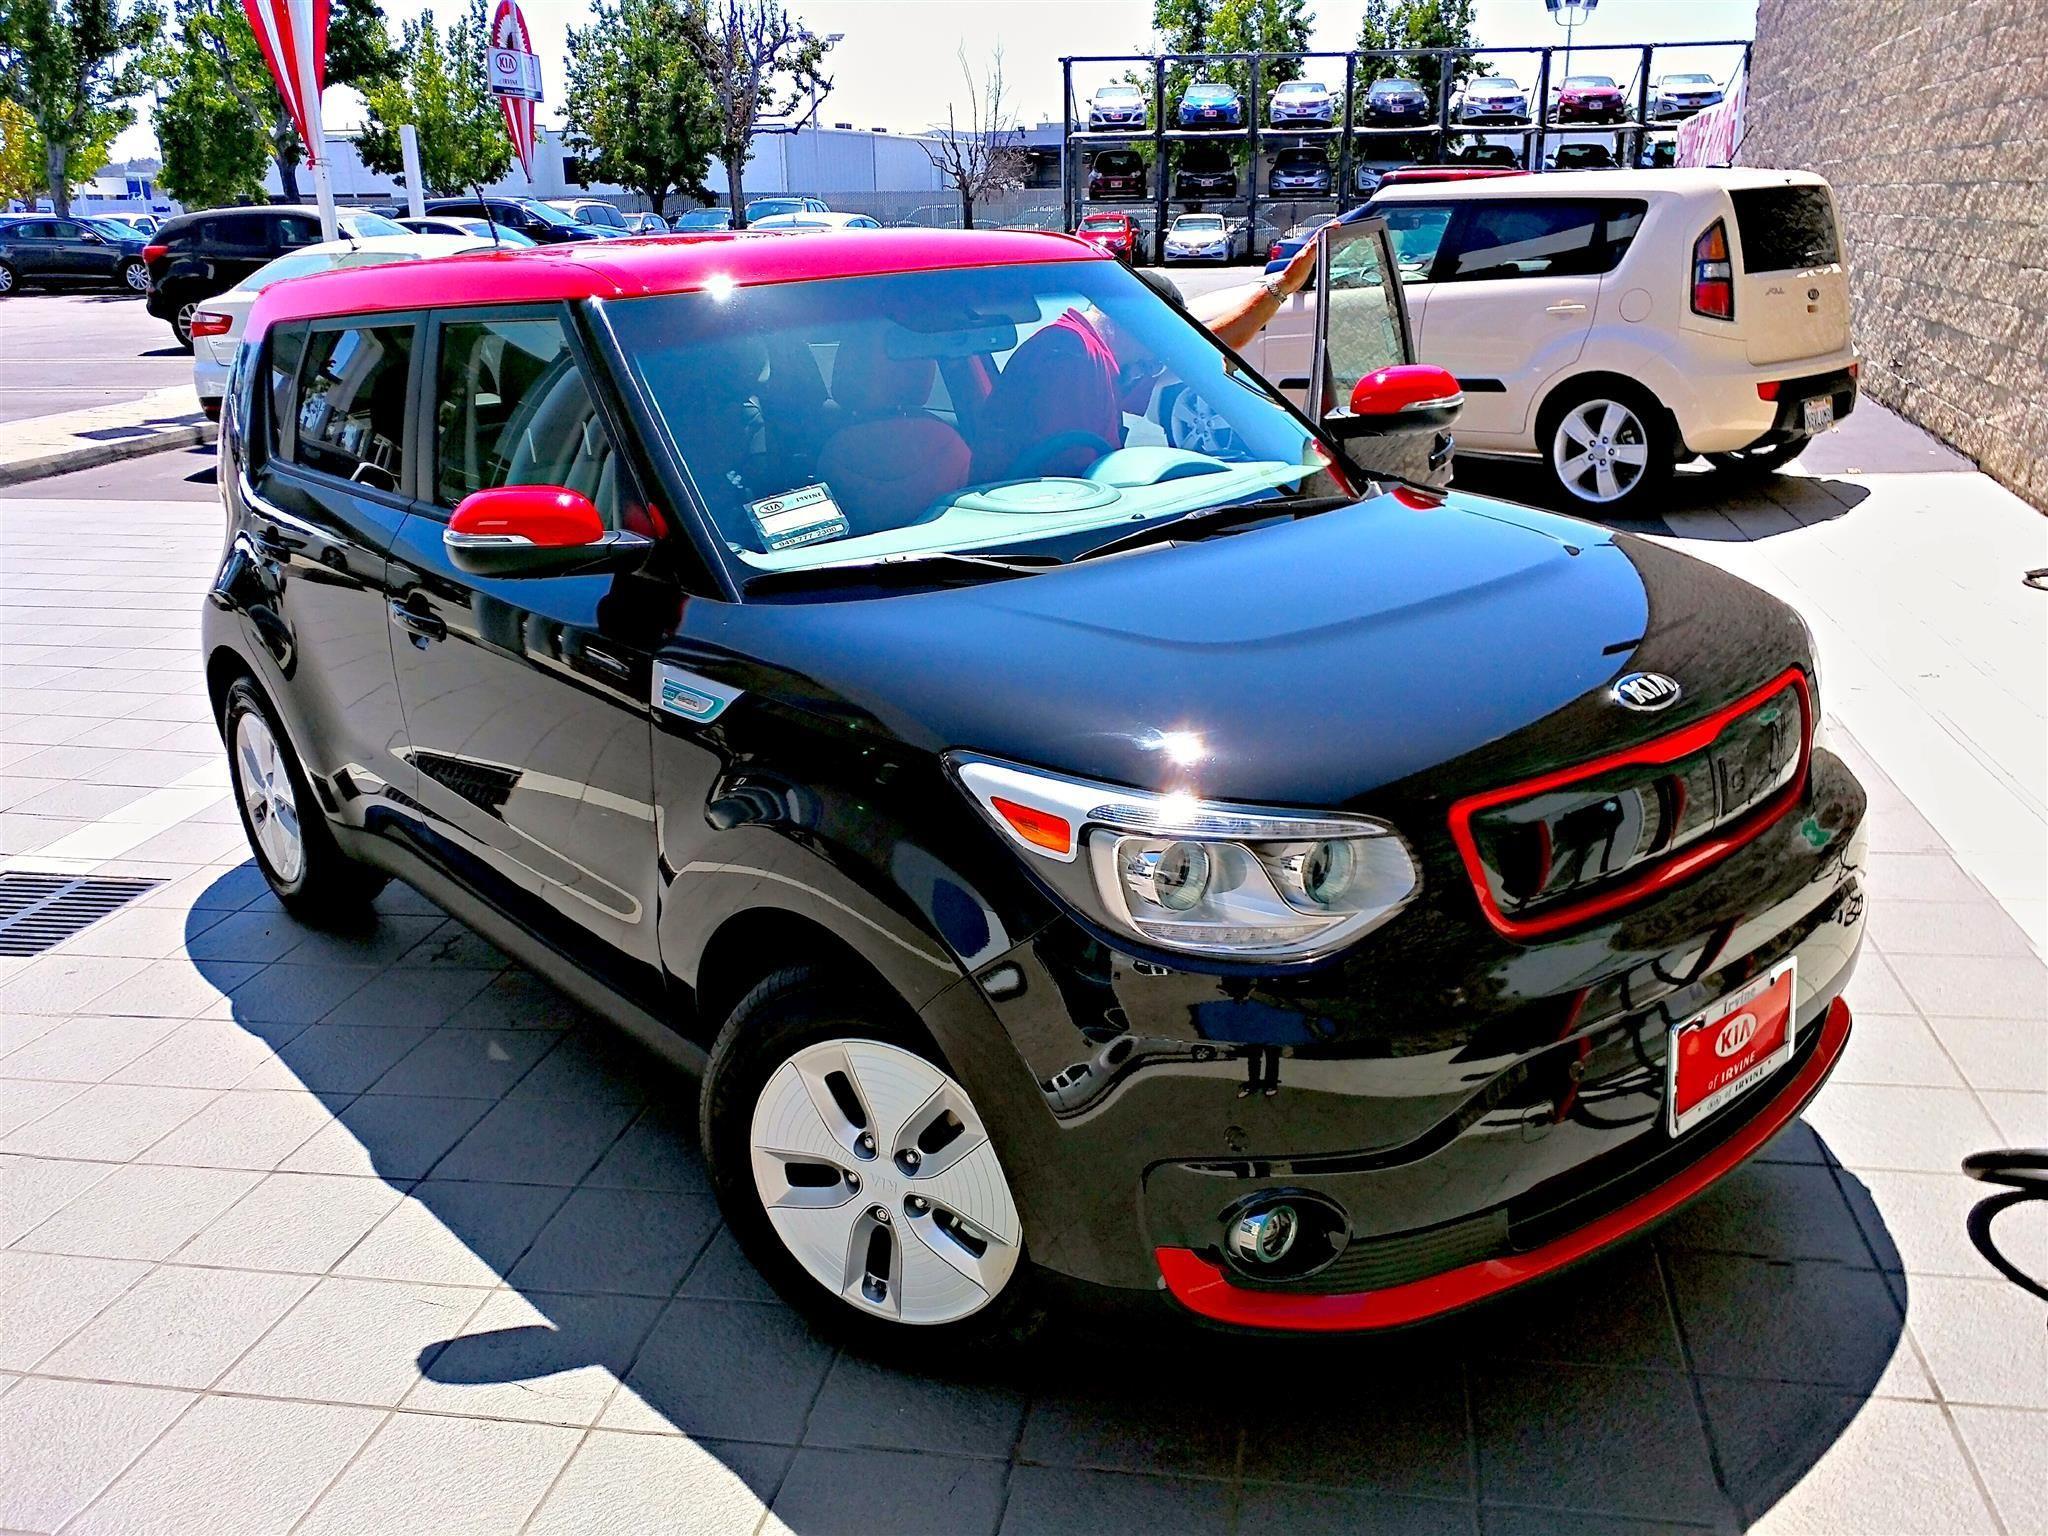 2015 Kia Soul Ev Electric Car Pledge Other 152244 With